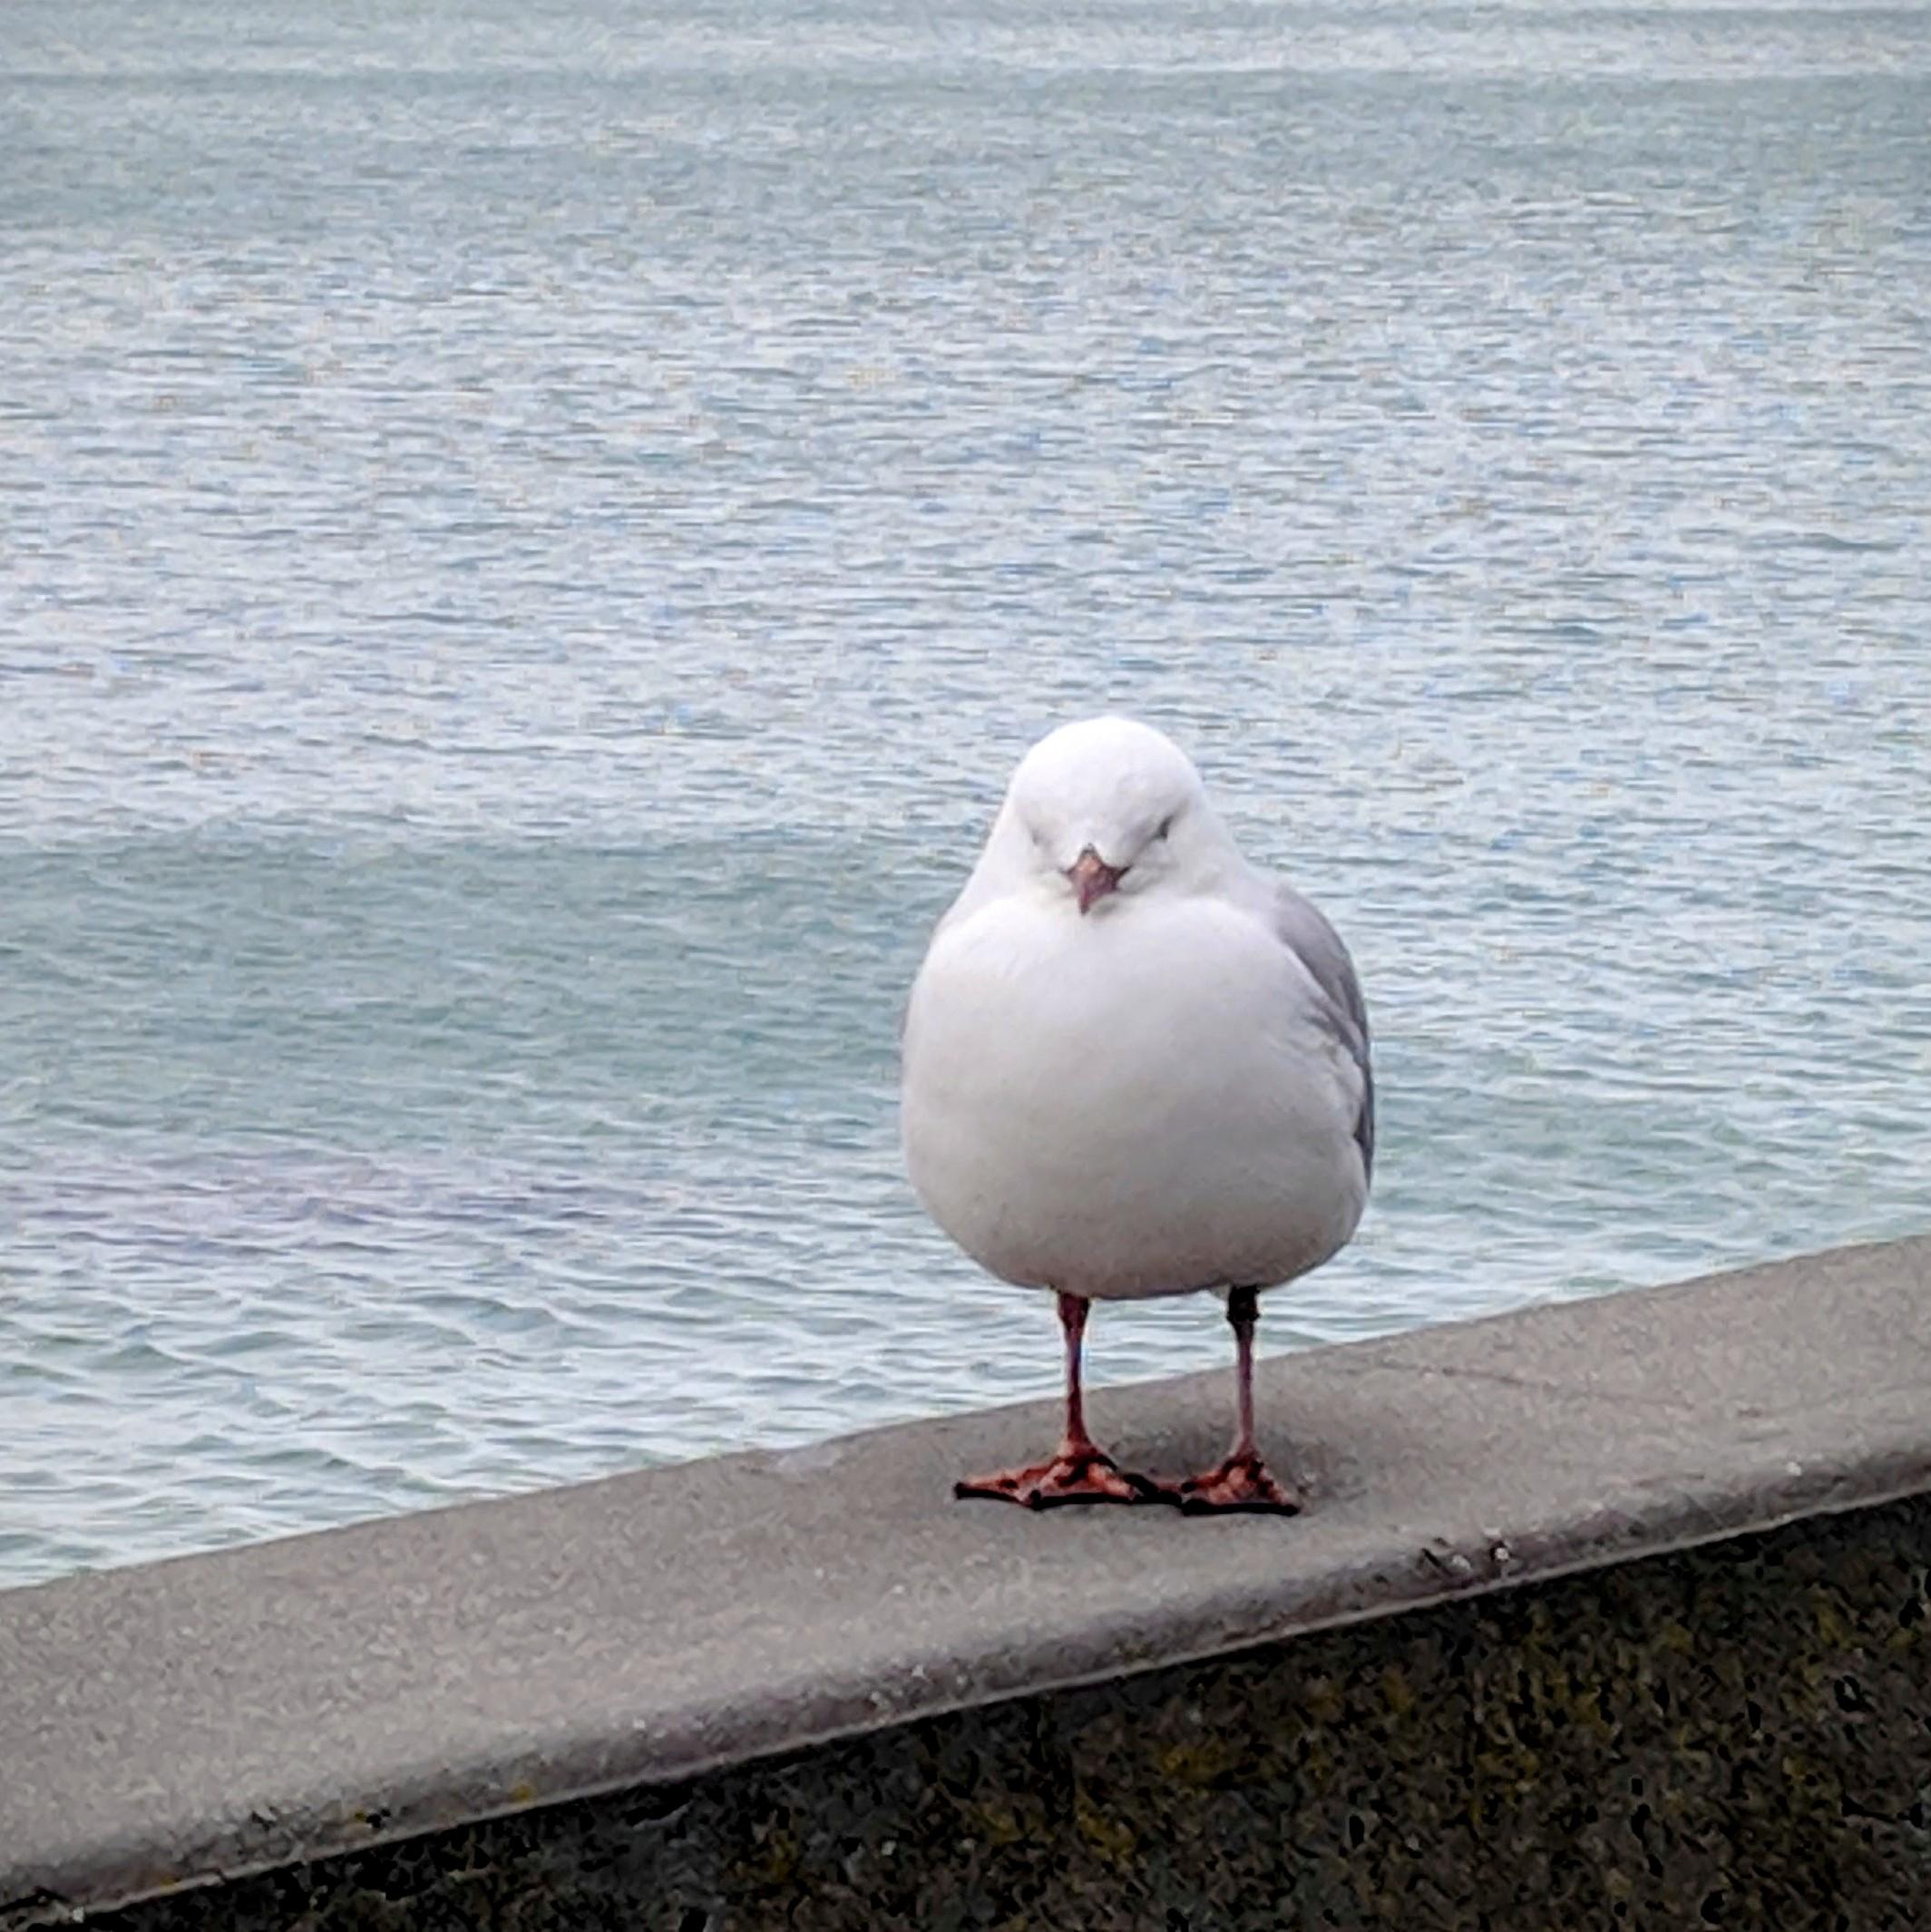 Plump with skinny legs gull